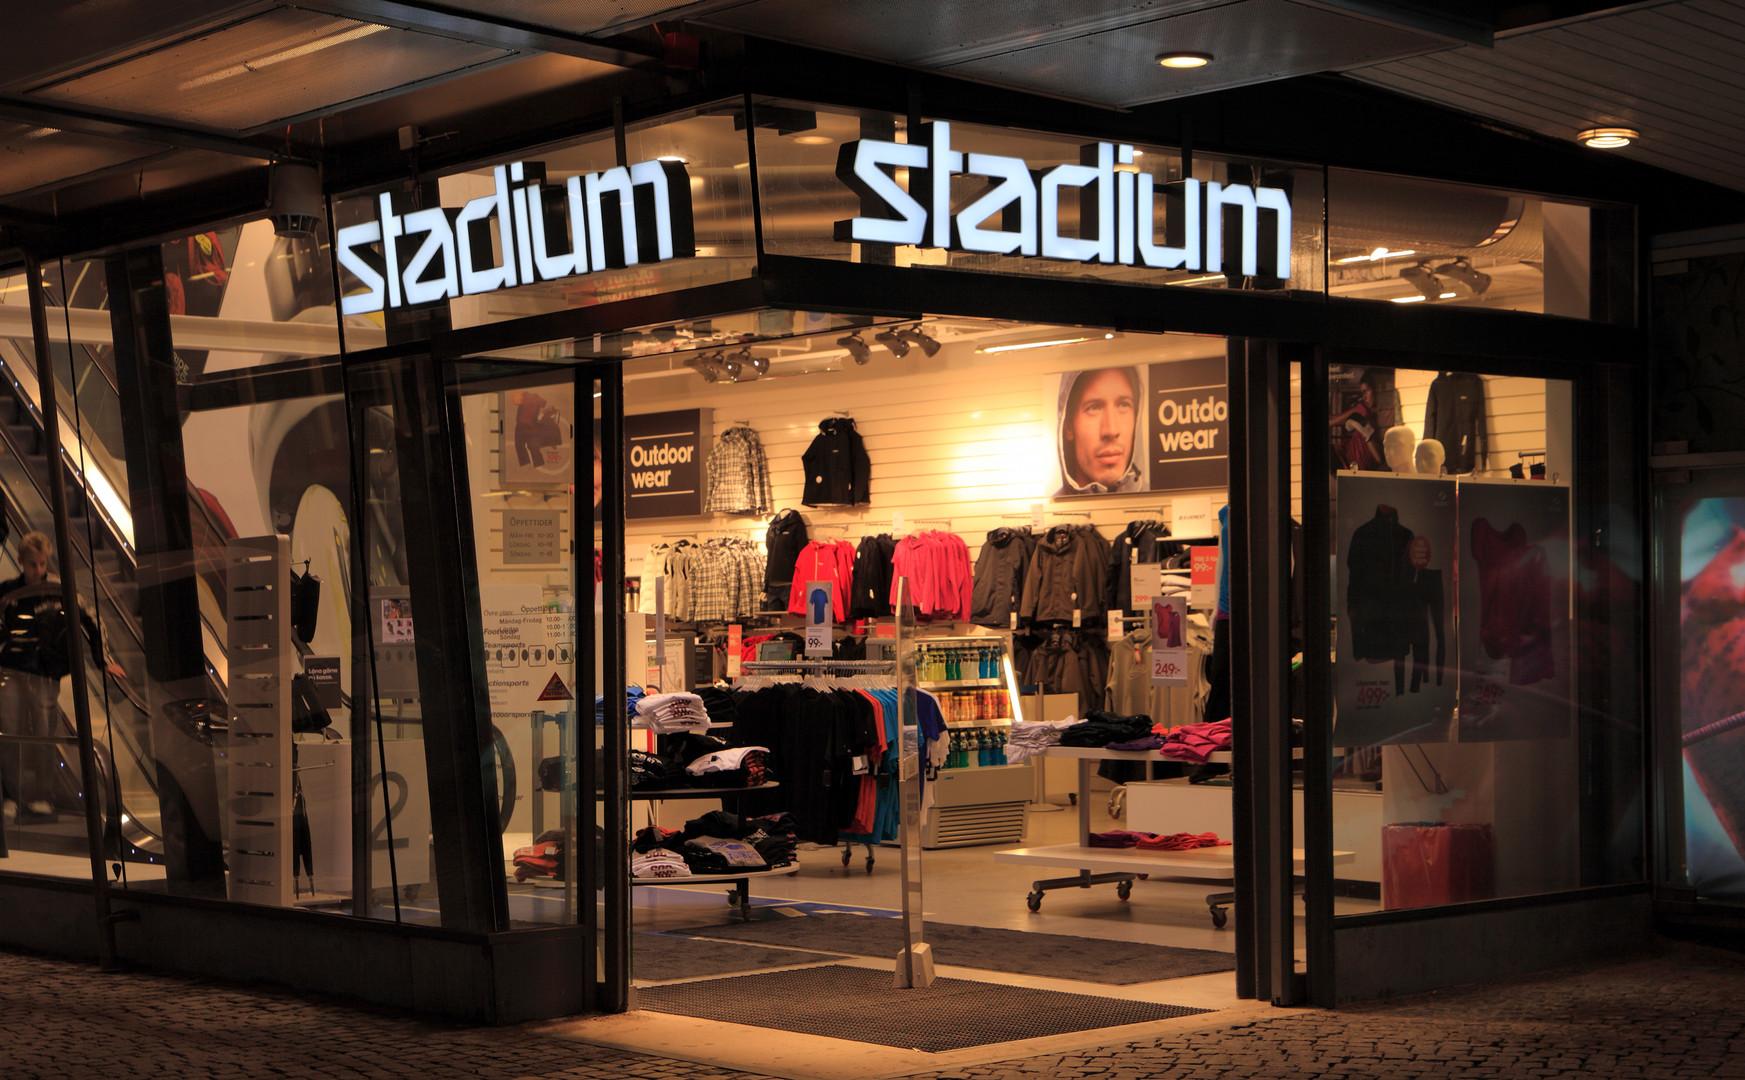 stadium-2.jpg